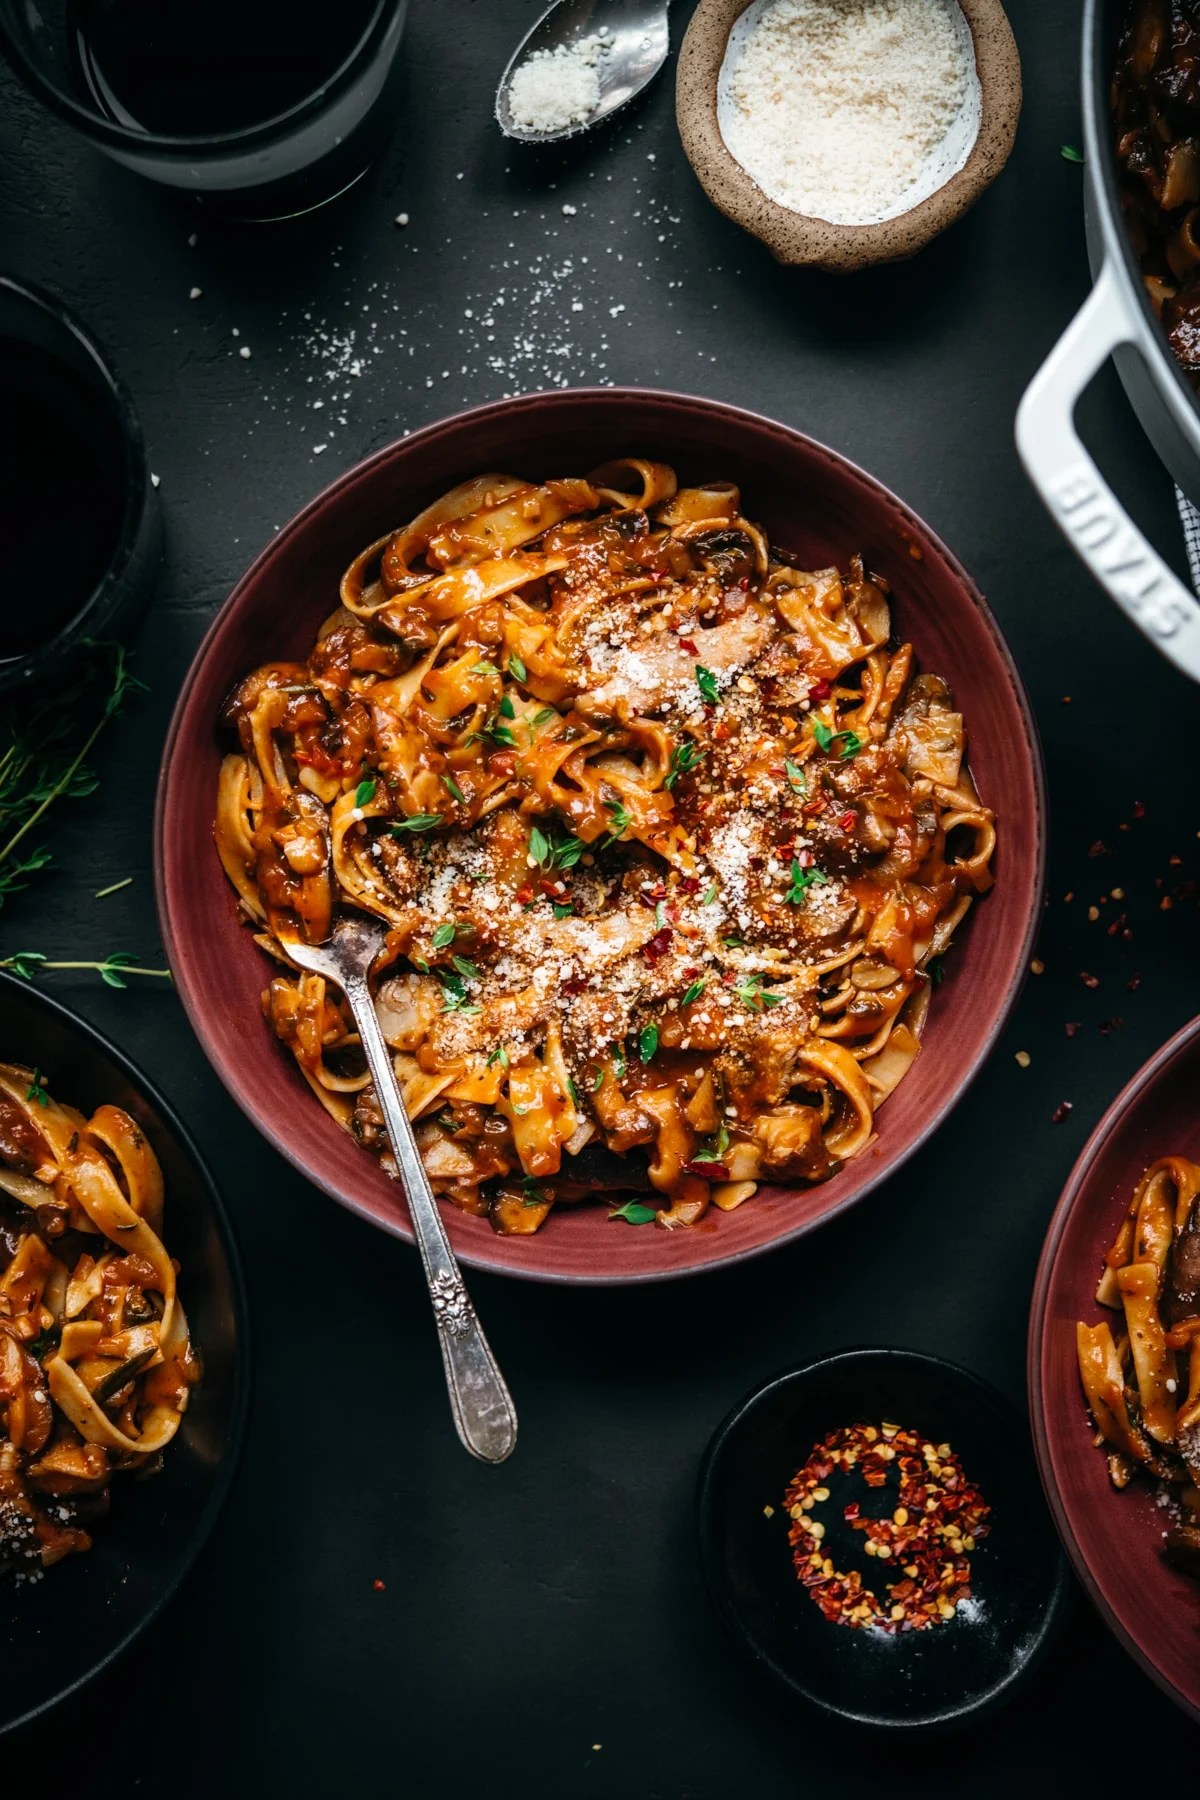 overhead view of vegan mushroom ragu over pasta in a red bowl.